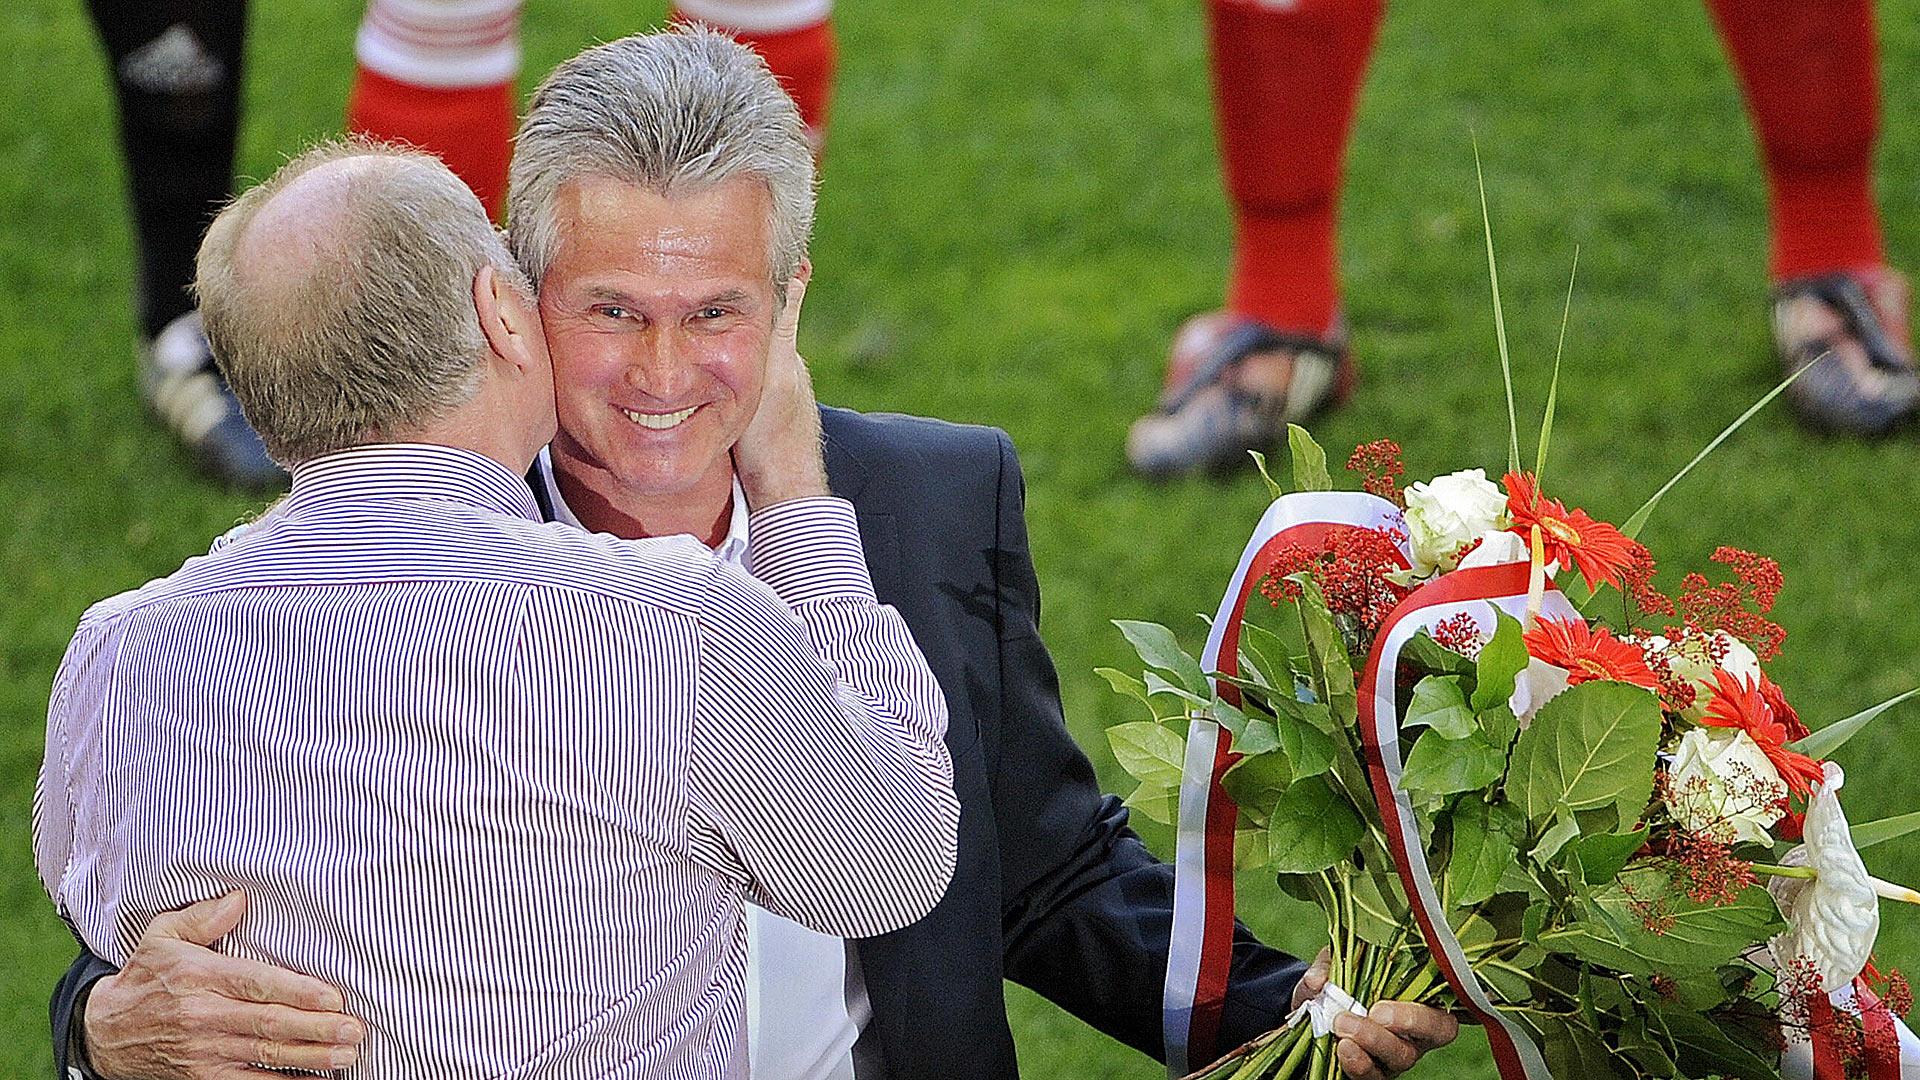 Uli Hoeneß Jupp Heynckes Bayern München 23052009